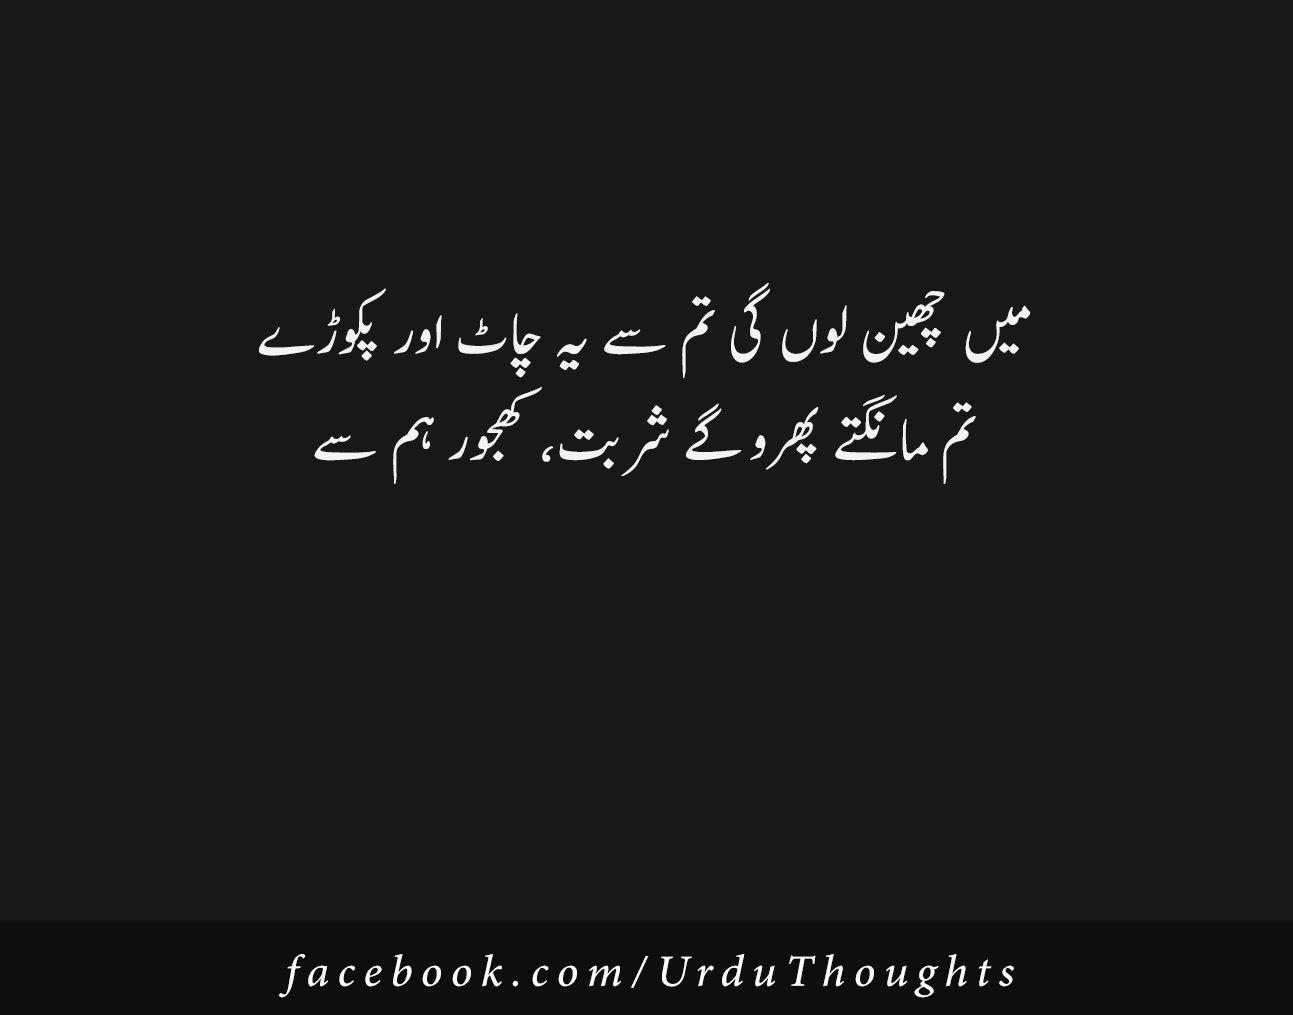 Urdu Funny 2 Line Poetry Mazahiya Shayari Urdu Thoughts In 2021 Queen Quotes Funny Urdu Thoughts Funny Quotes